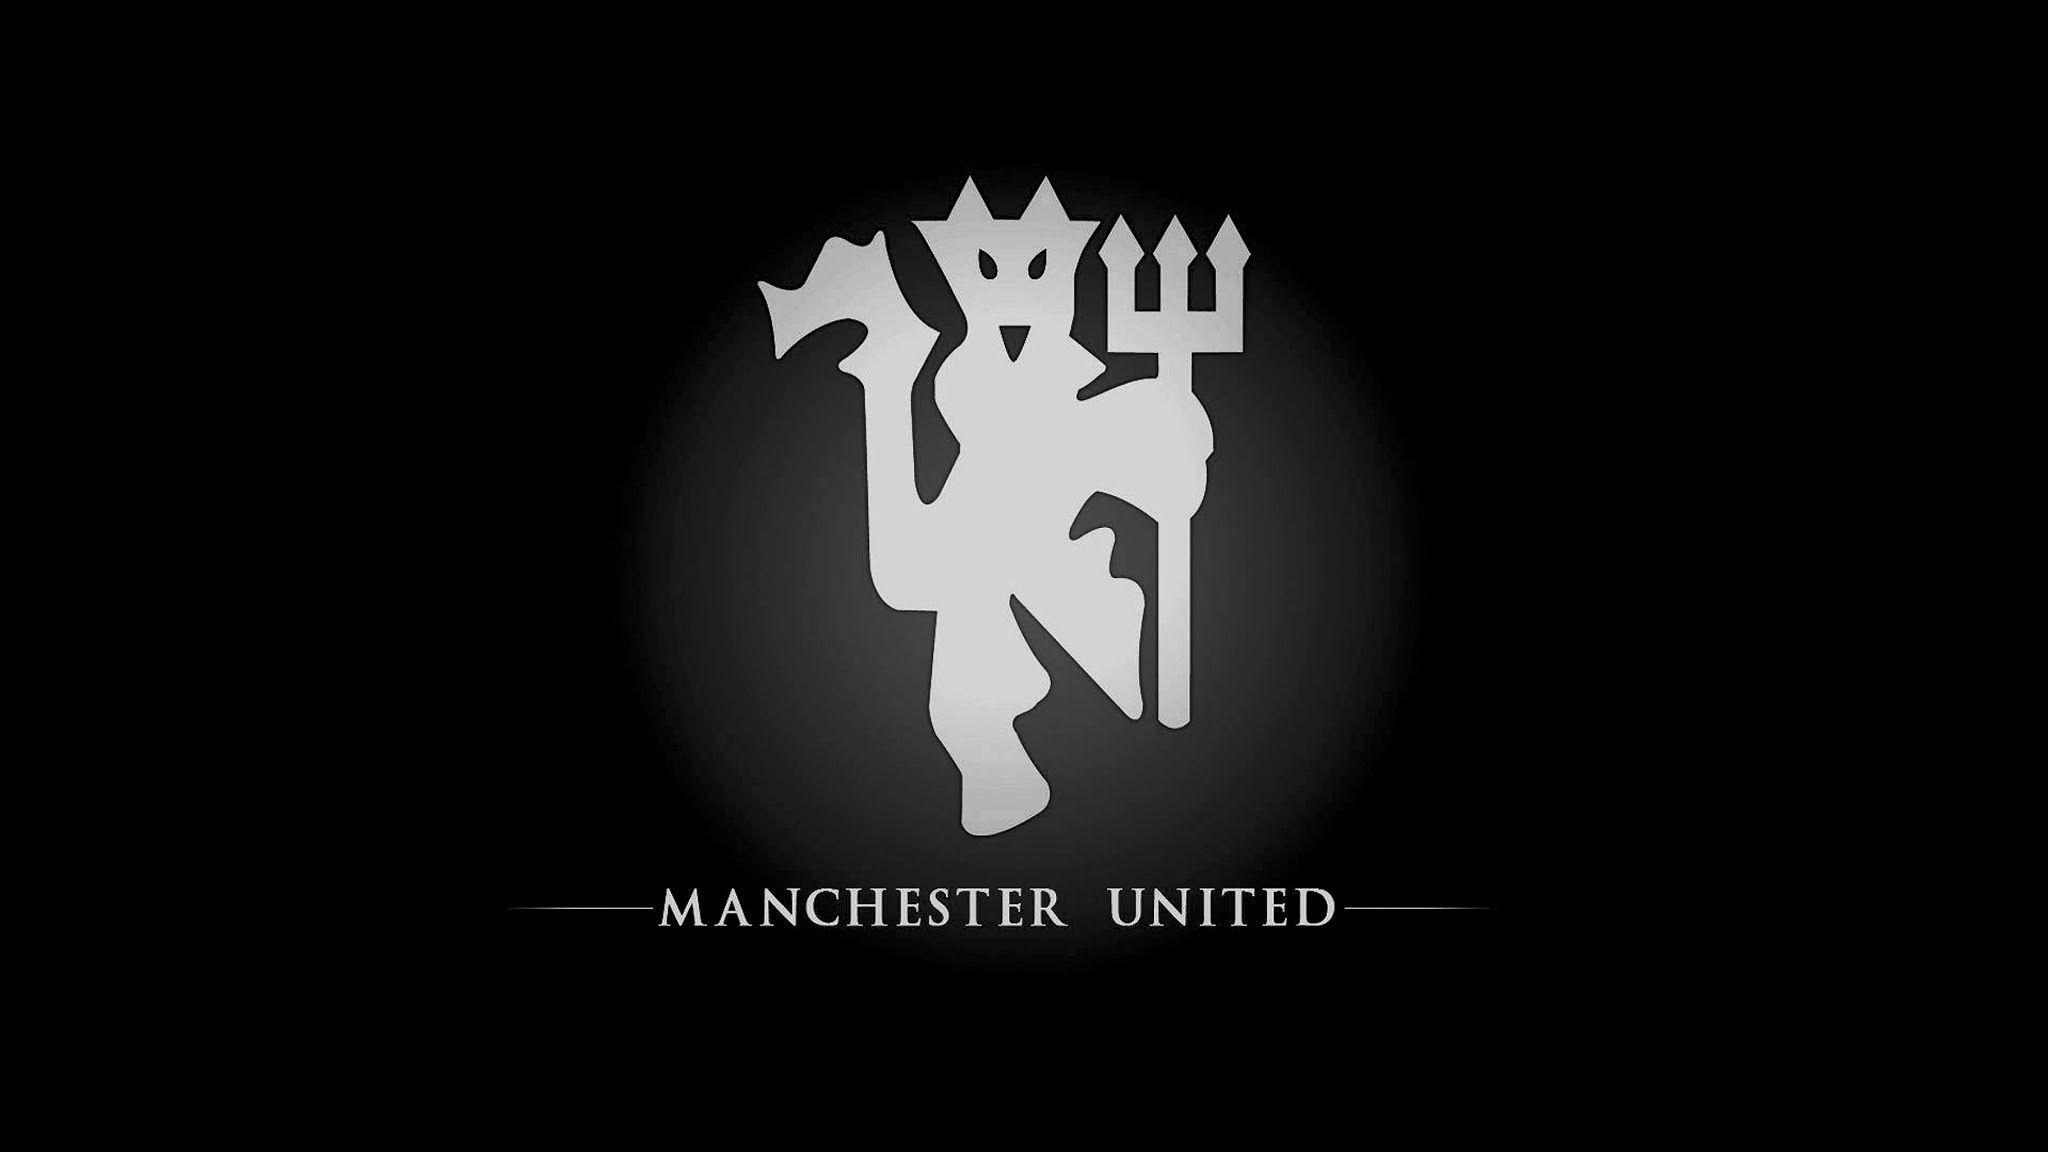 Manchester United Logo Wallpapers Hd 2016 Wallpaper Cave Manchester United Wallpaper Manchester United Logo Logo Wallpaper Hd